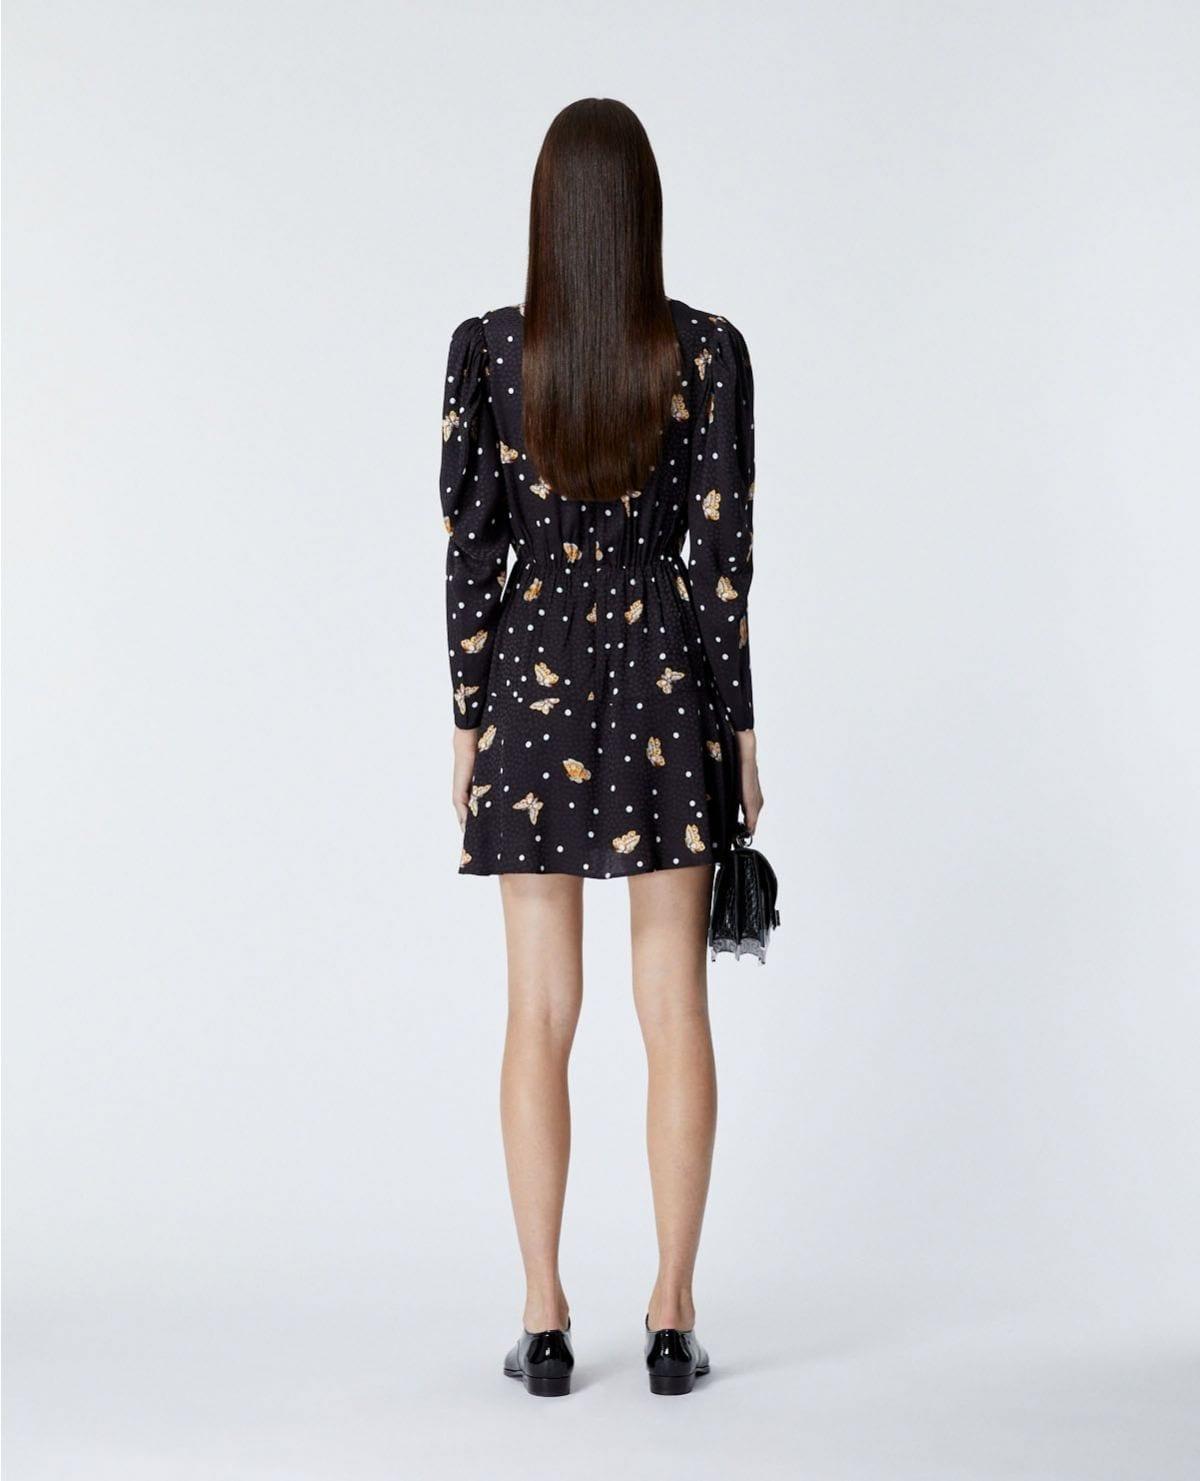 THE KOOPLES Short Black Dress